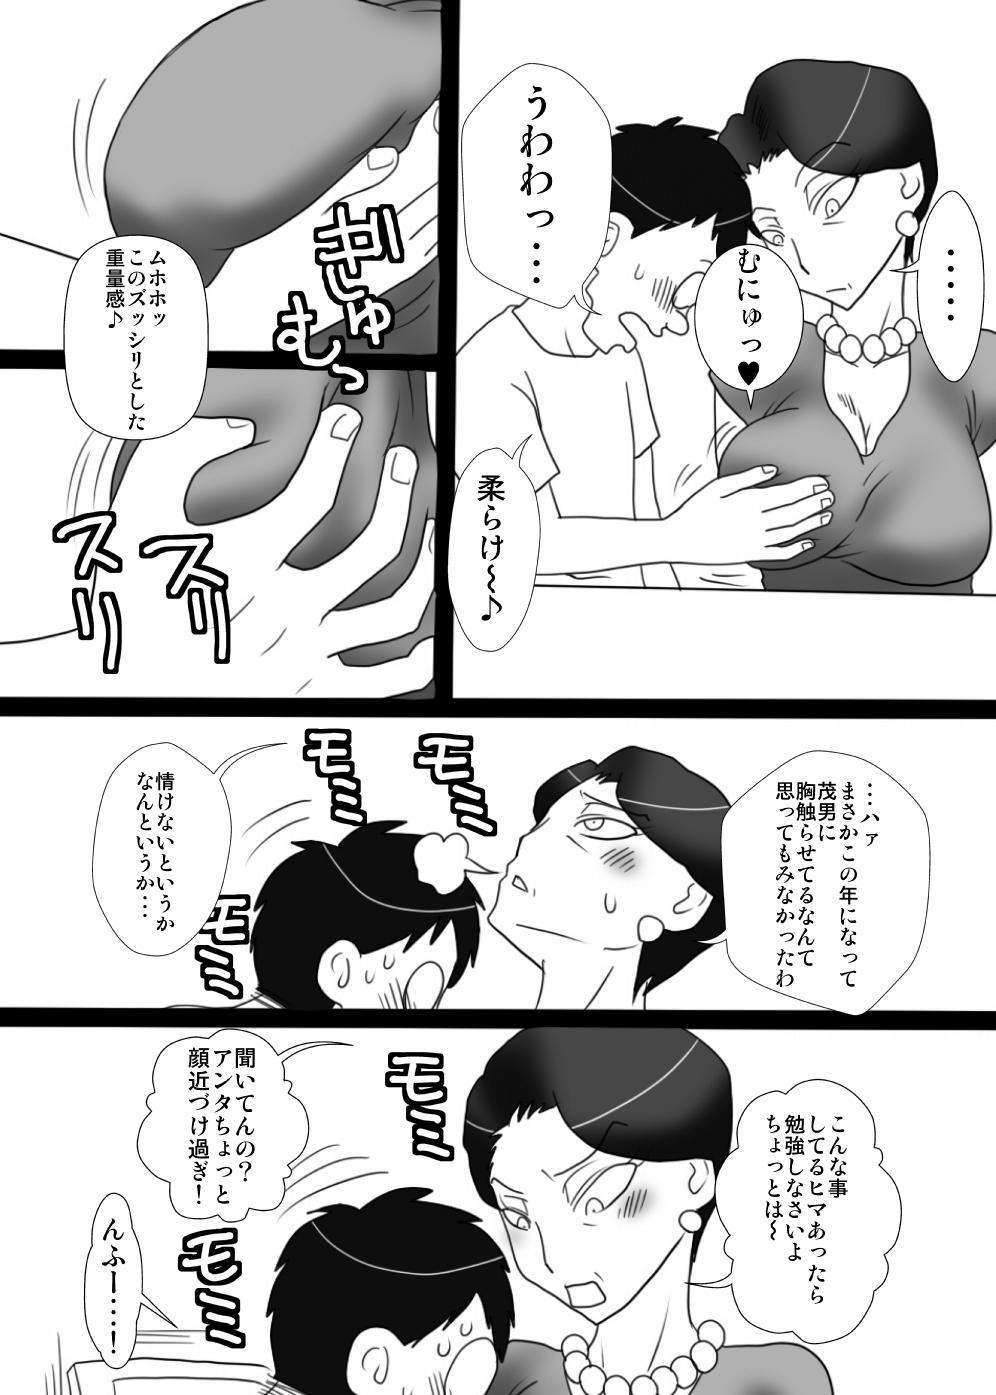 Oba-san o Otosuze! 7